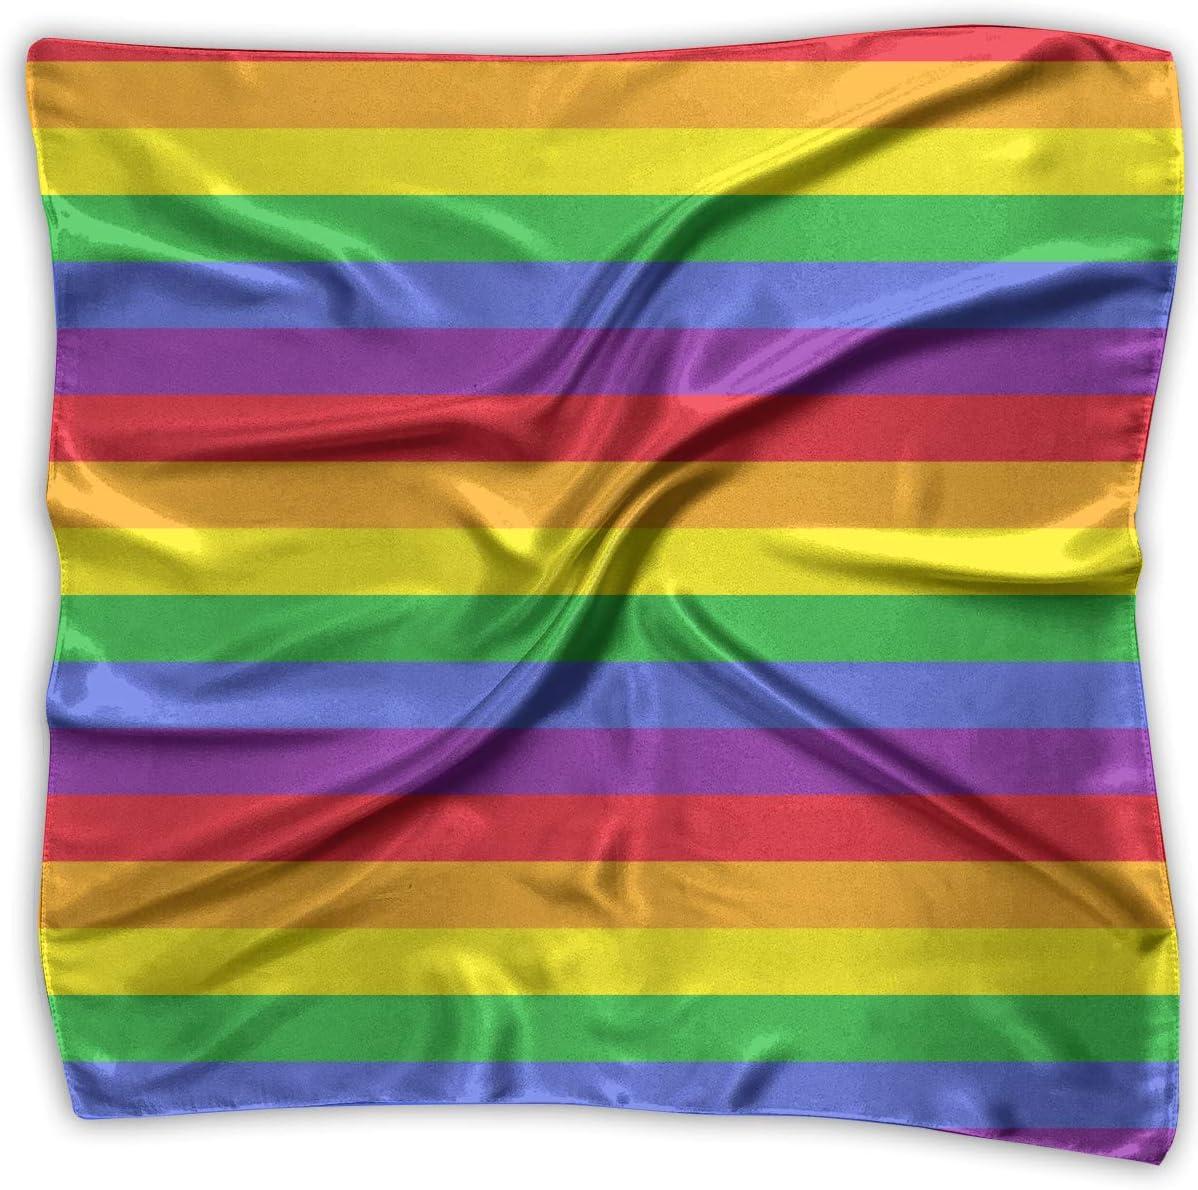 YANGZXC LGBT Gay Pride Rainbow Stripes Handkerchief Polyester Pocket Square Mulipurpose Silk Bandanas Delicate Printing